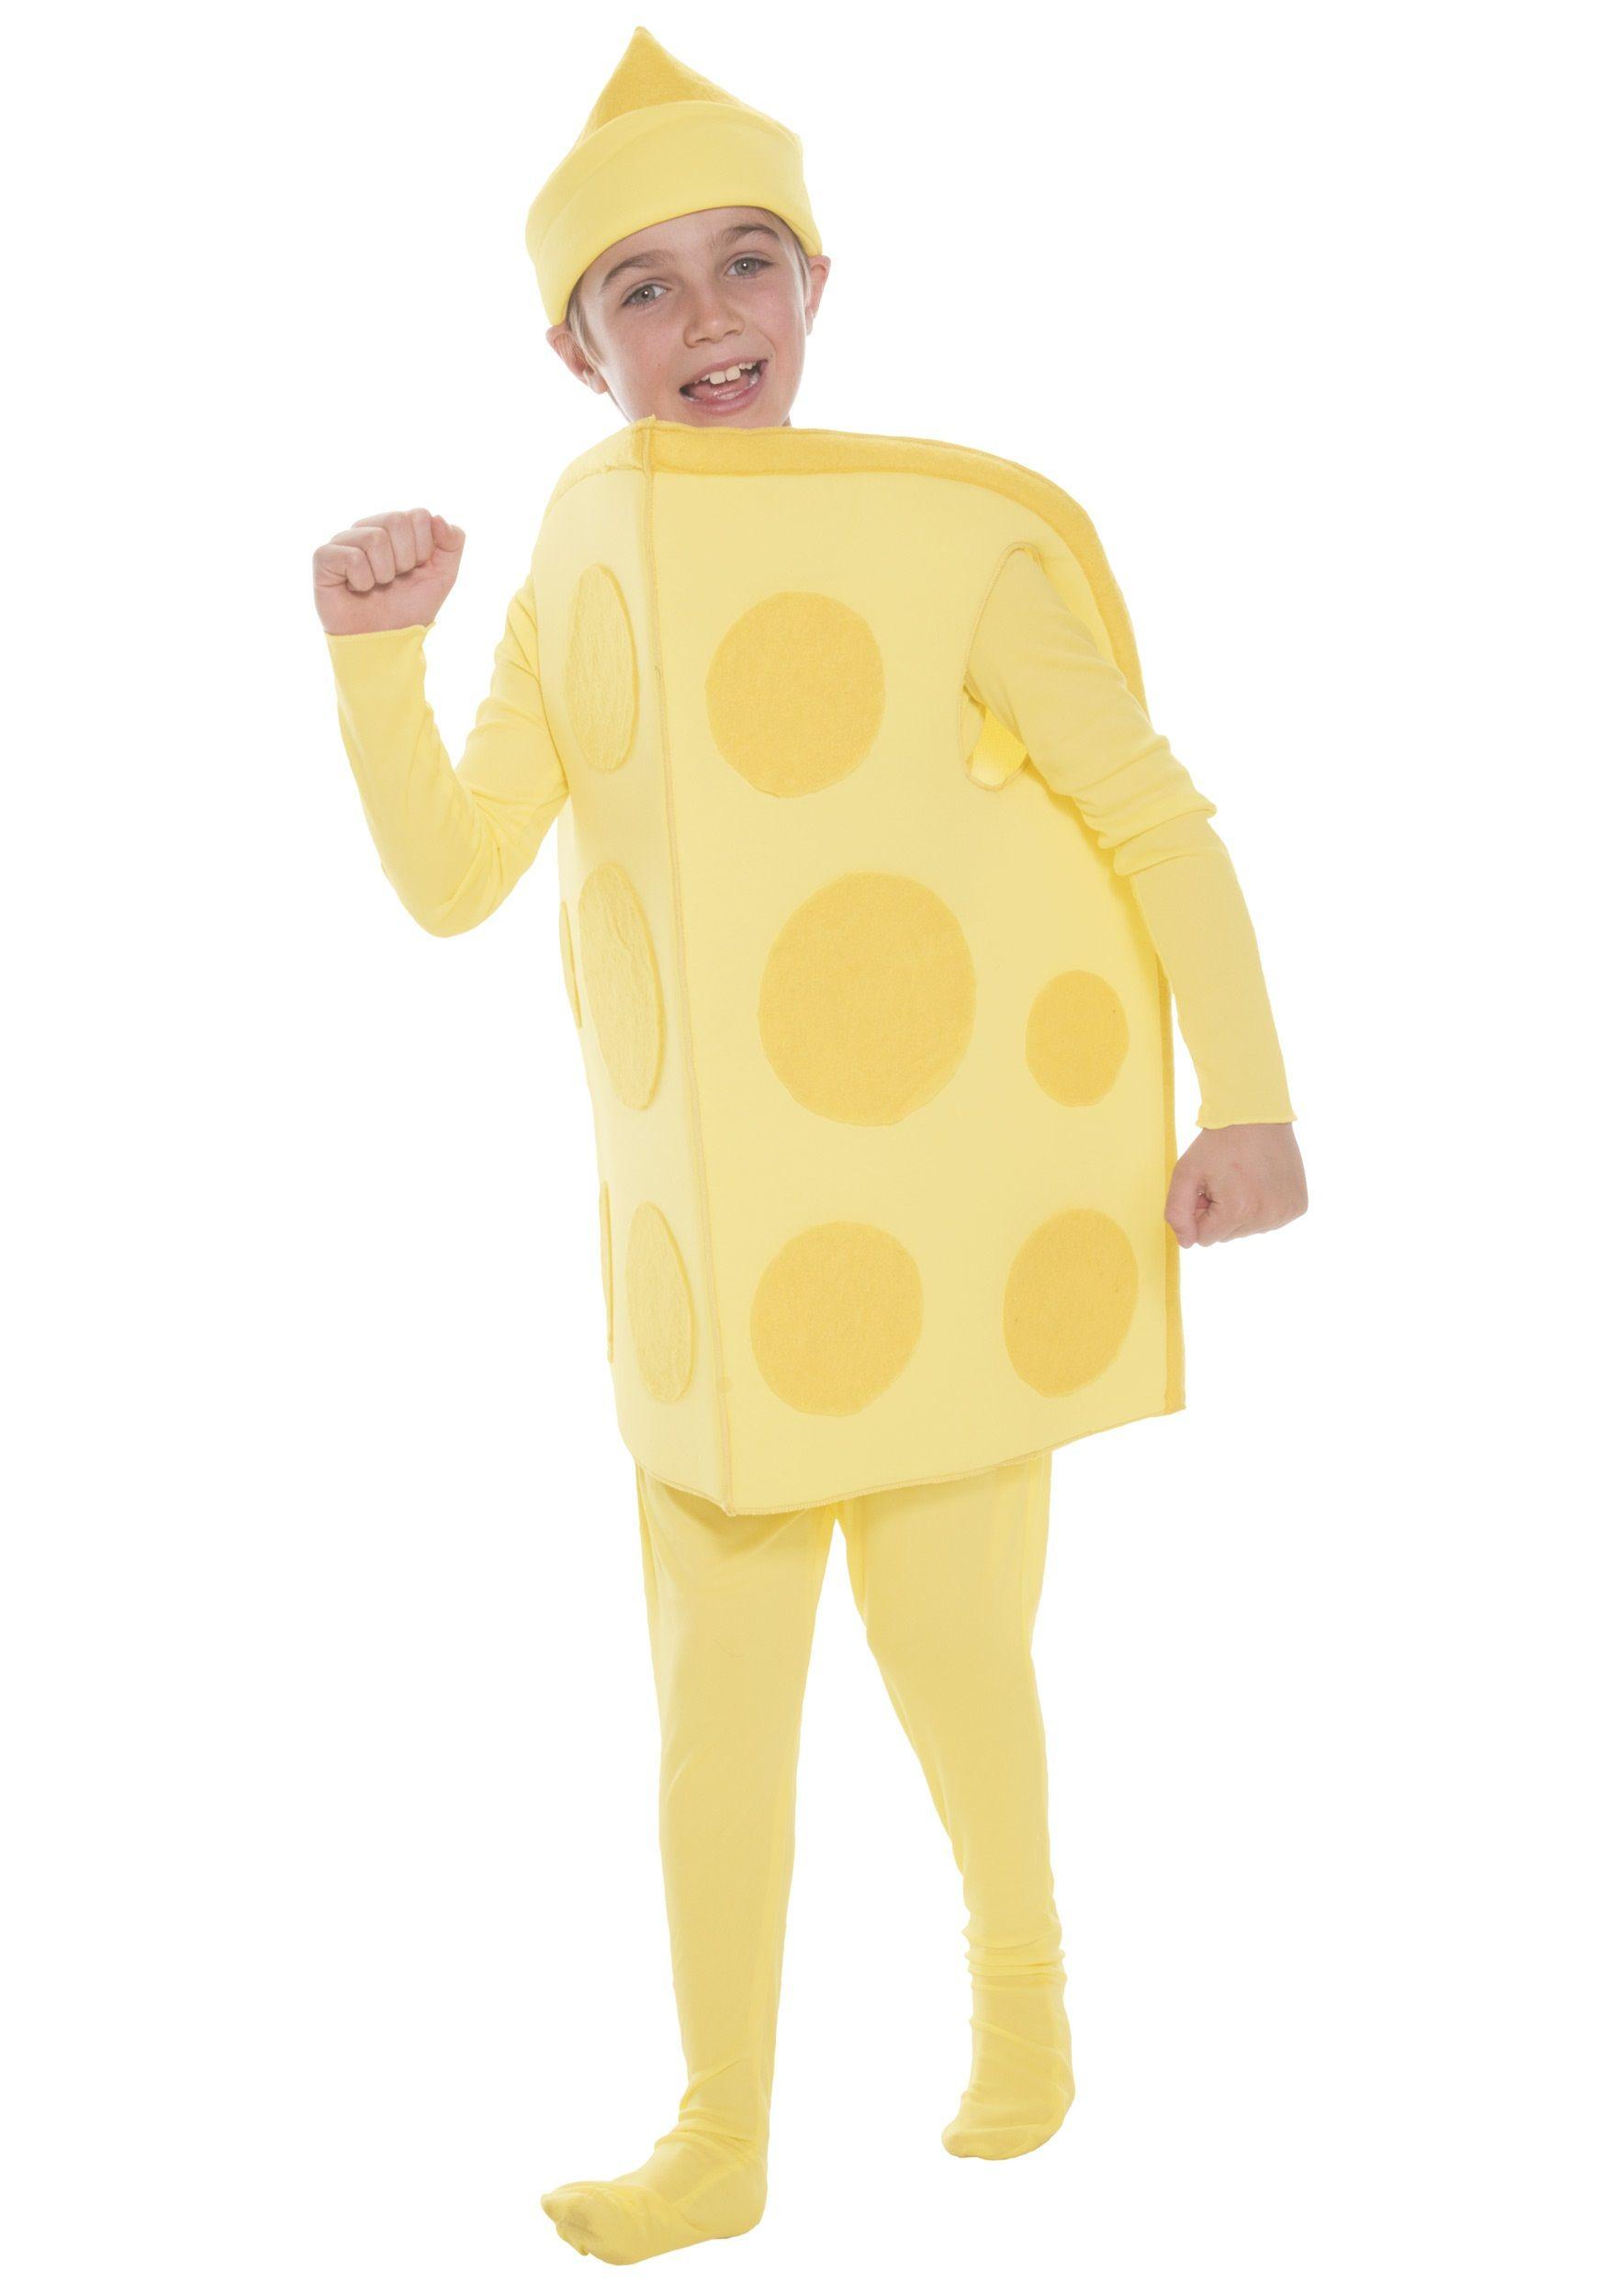 Child Cheese Costume | Cheese costume, Costumes and Halloween costumes